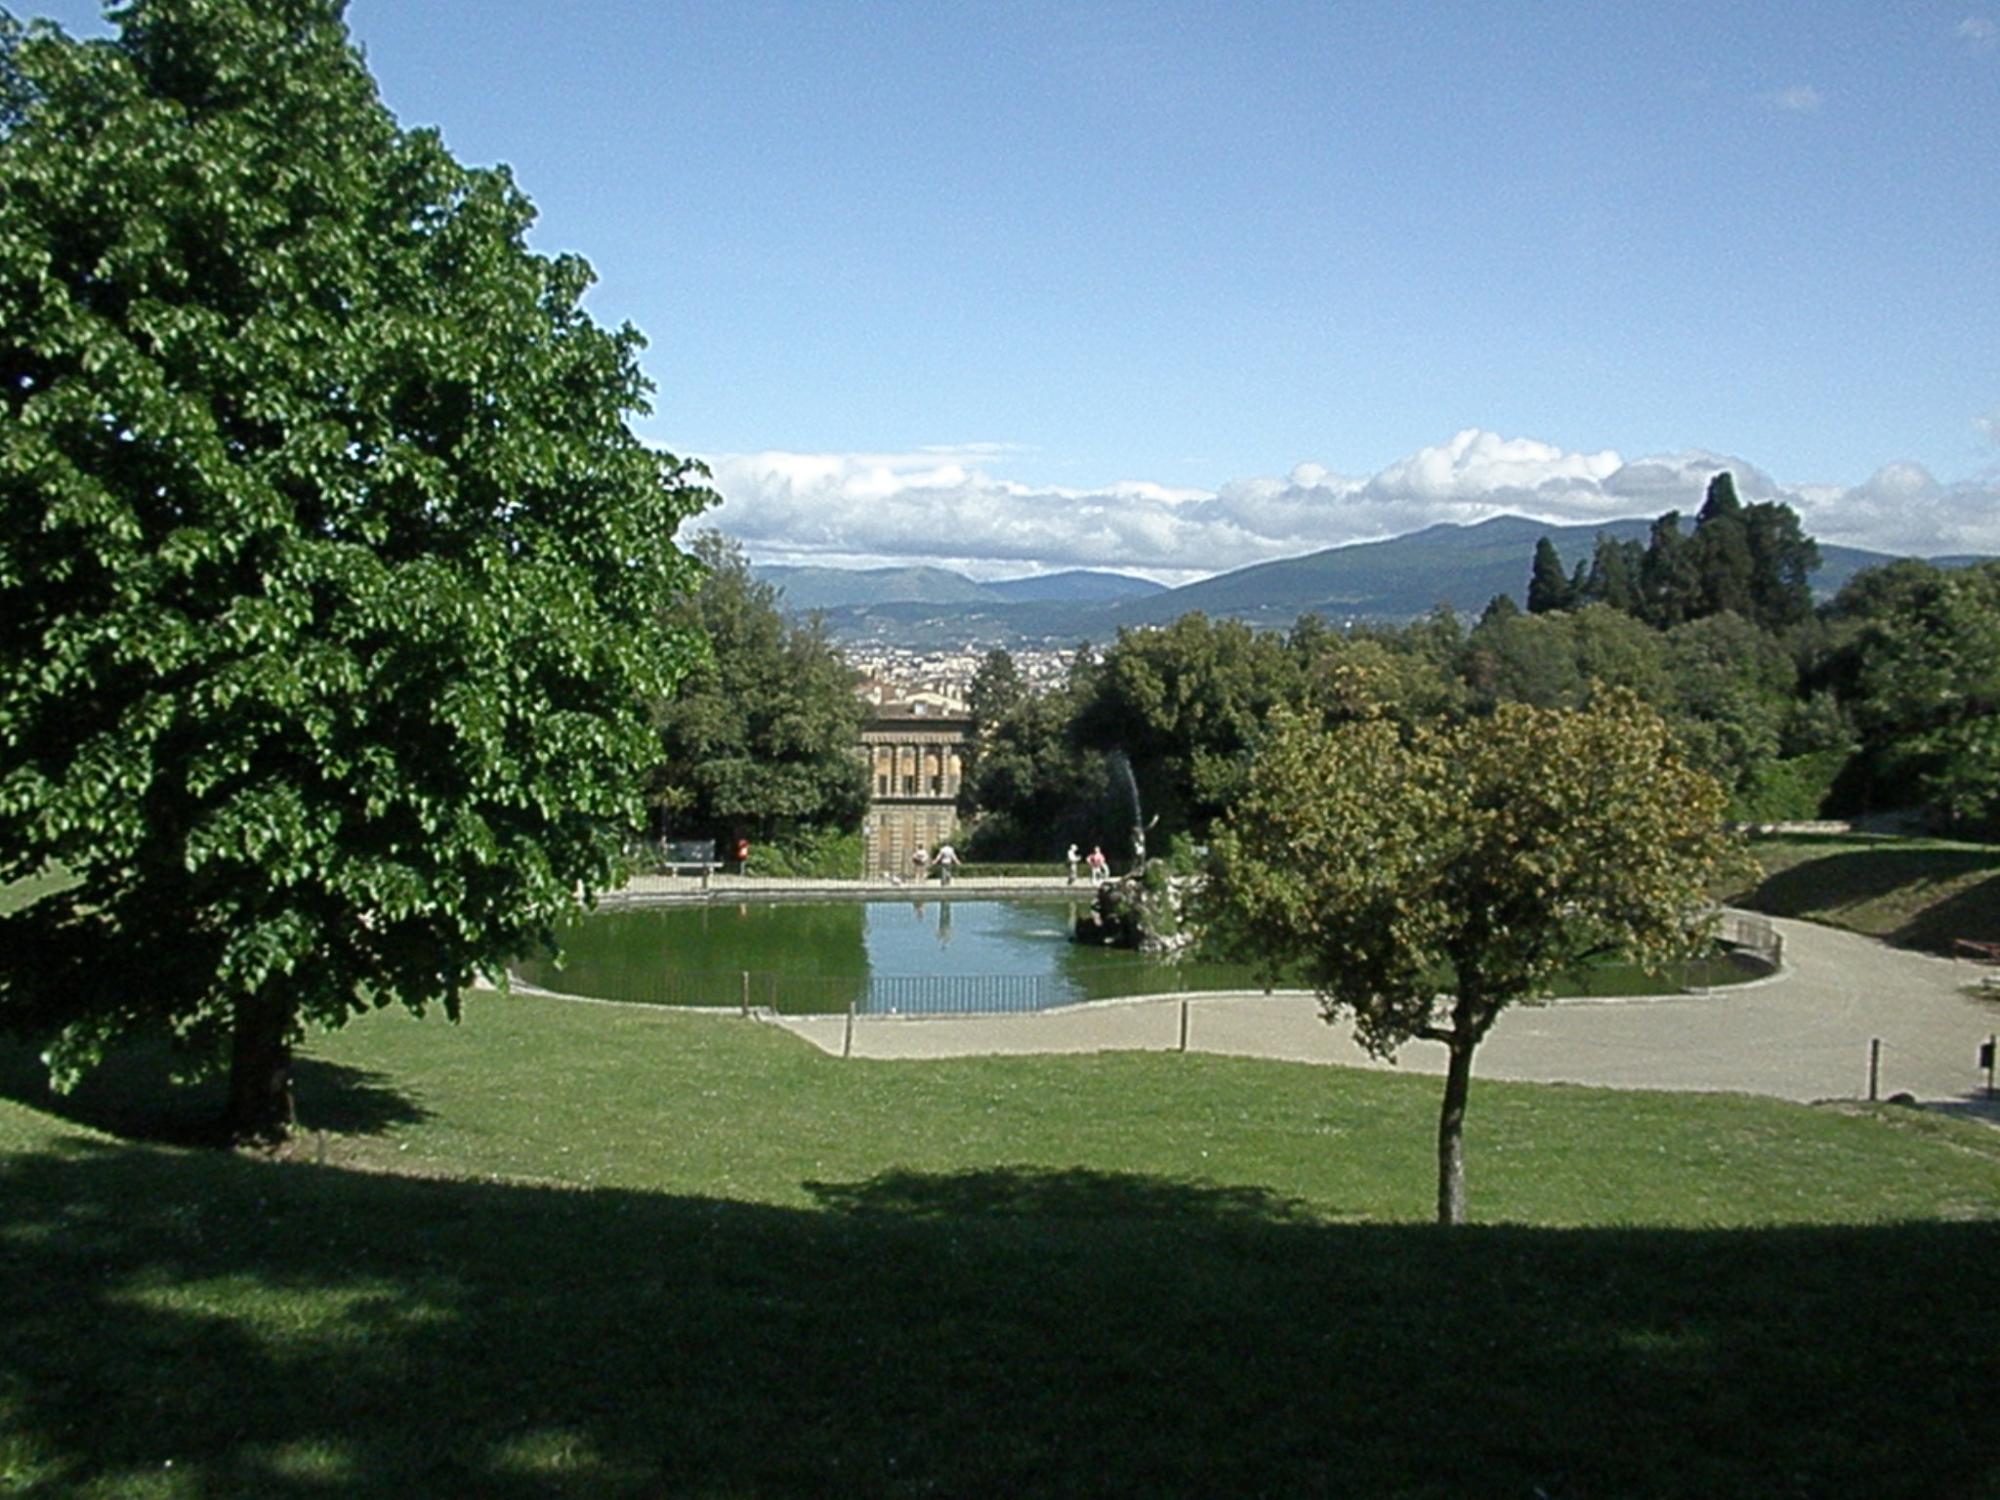 Boboli Gardens the green heart of Florence